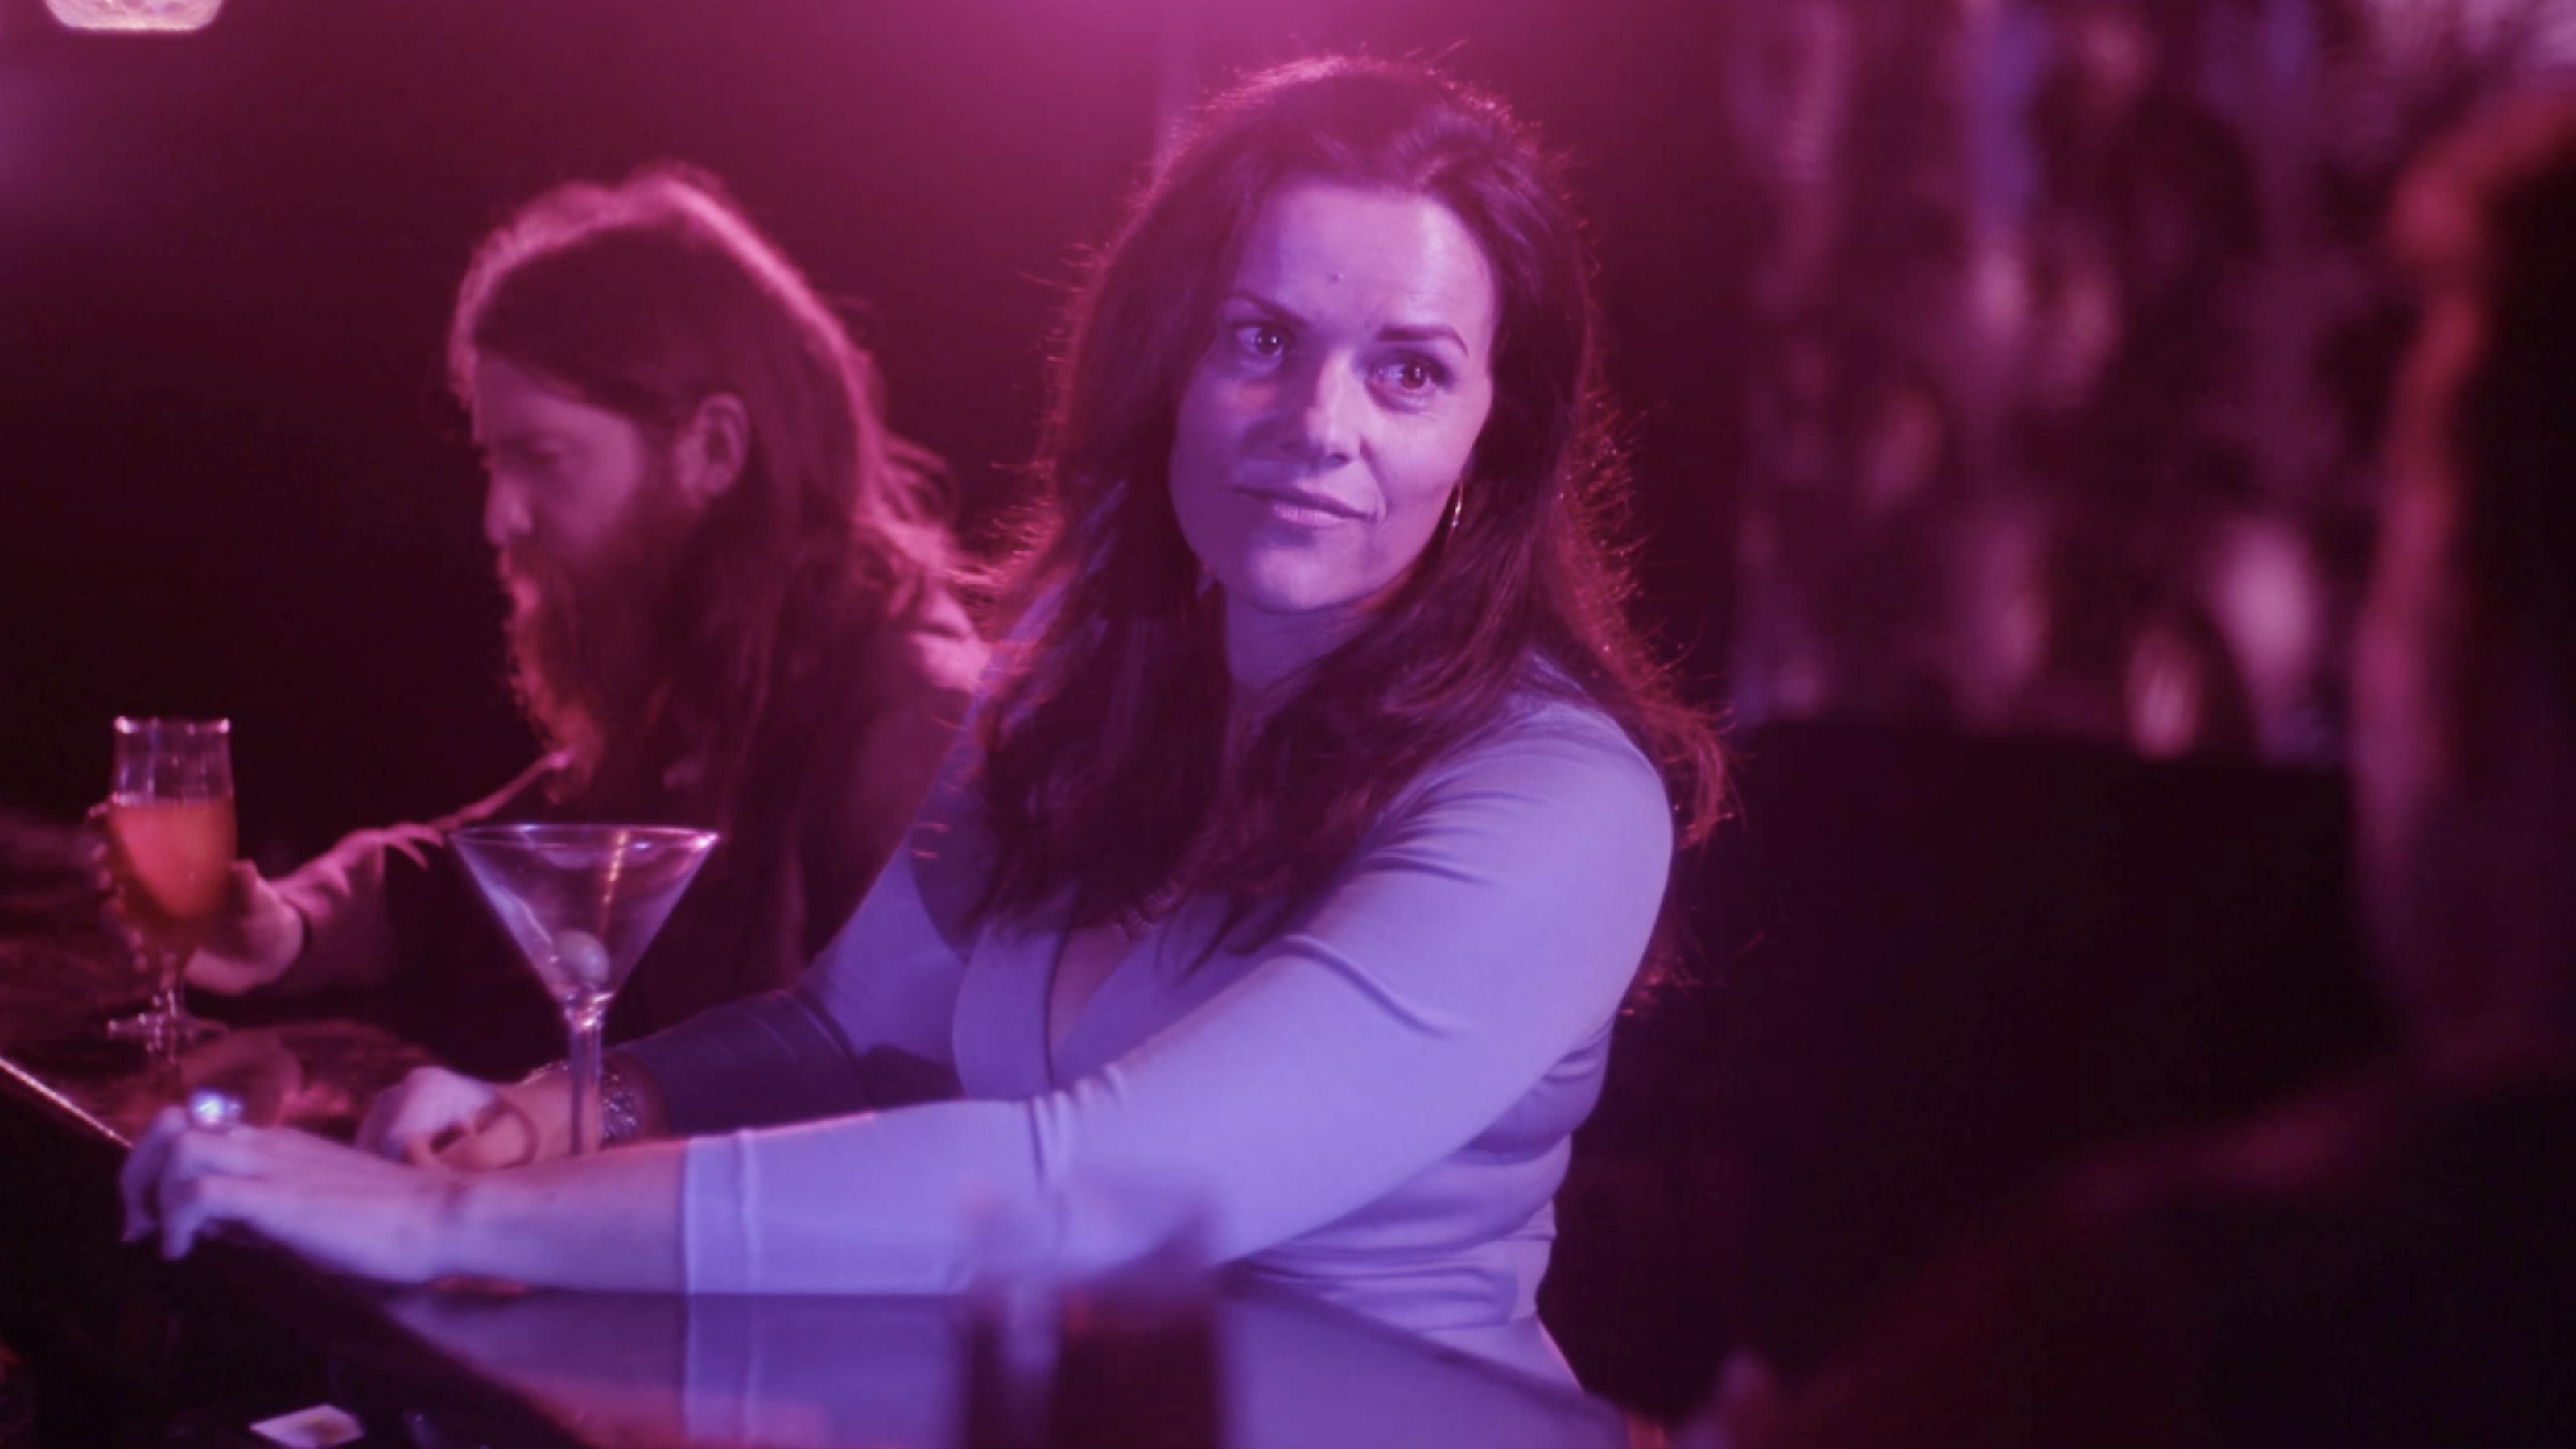 Amanda Billing in 'The Sisterhood'